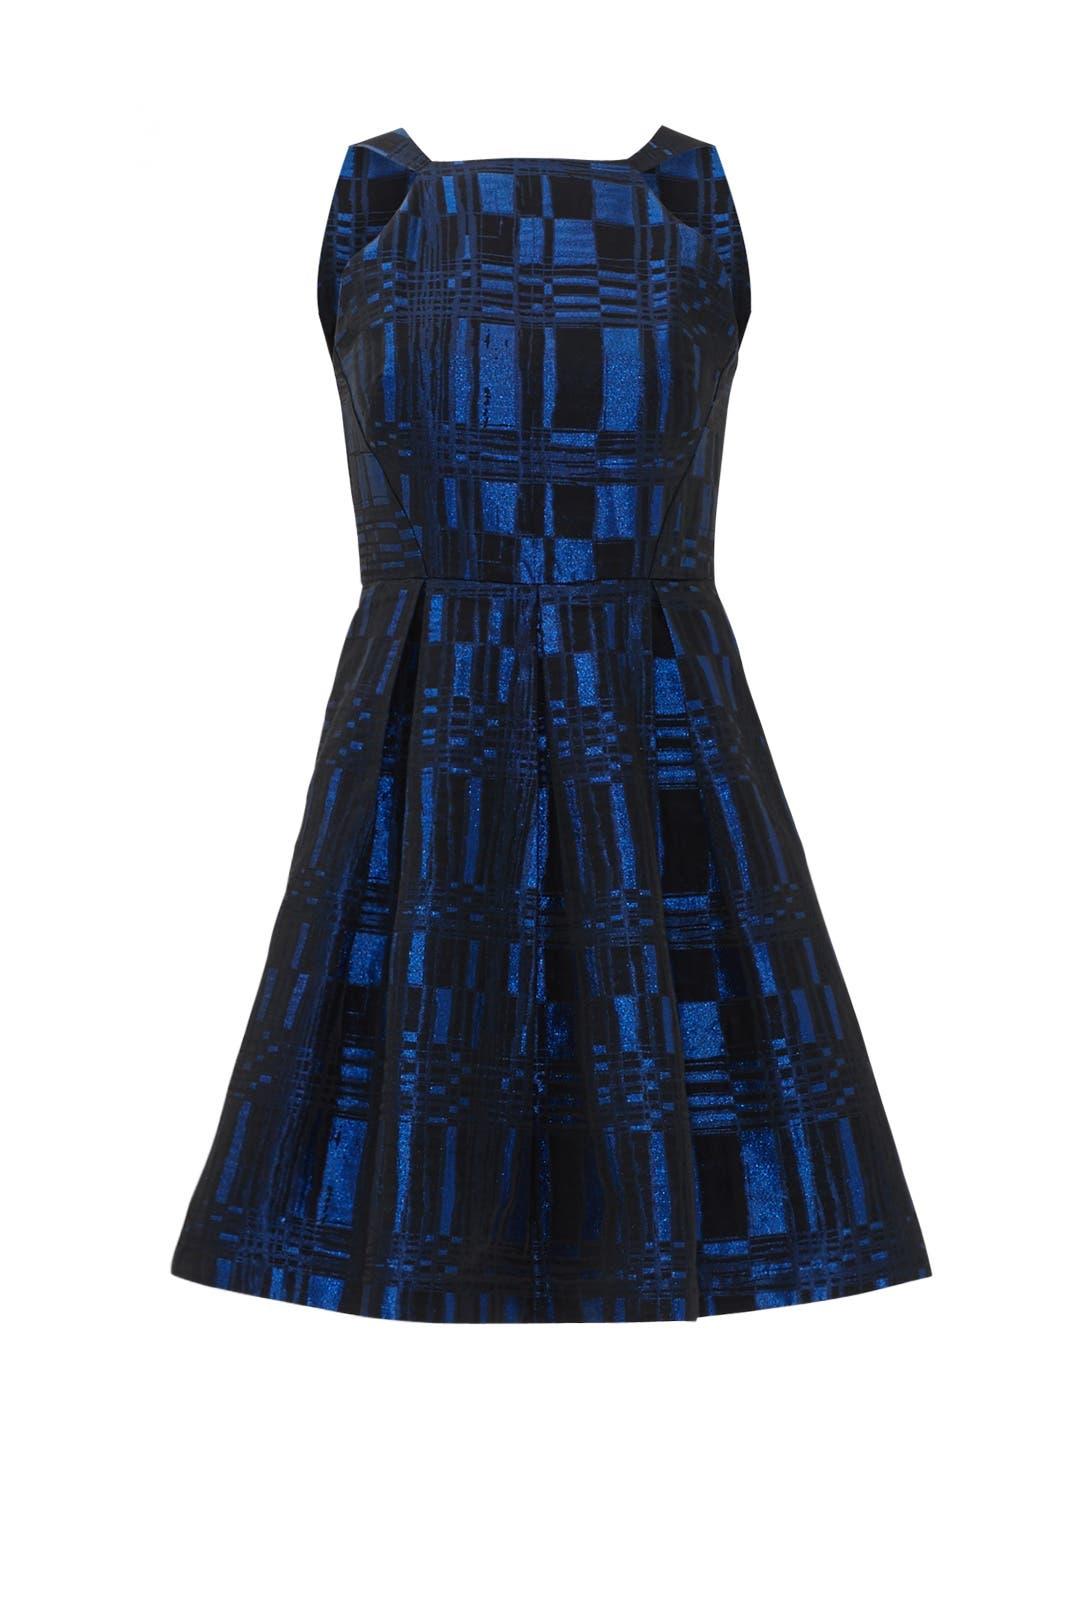 Nova Dress by Eva Franco